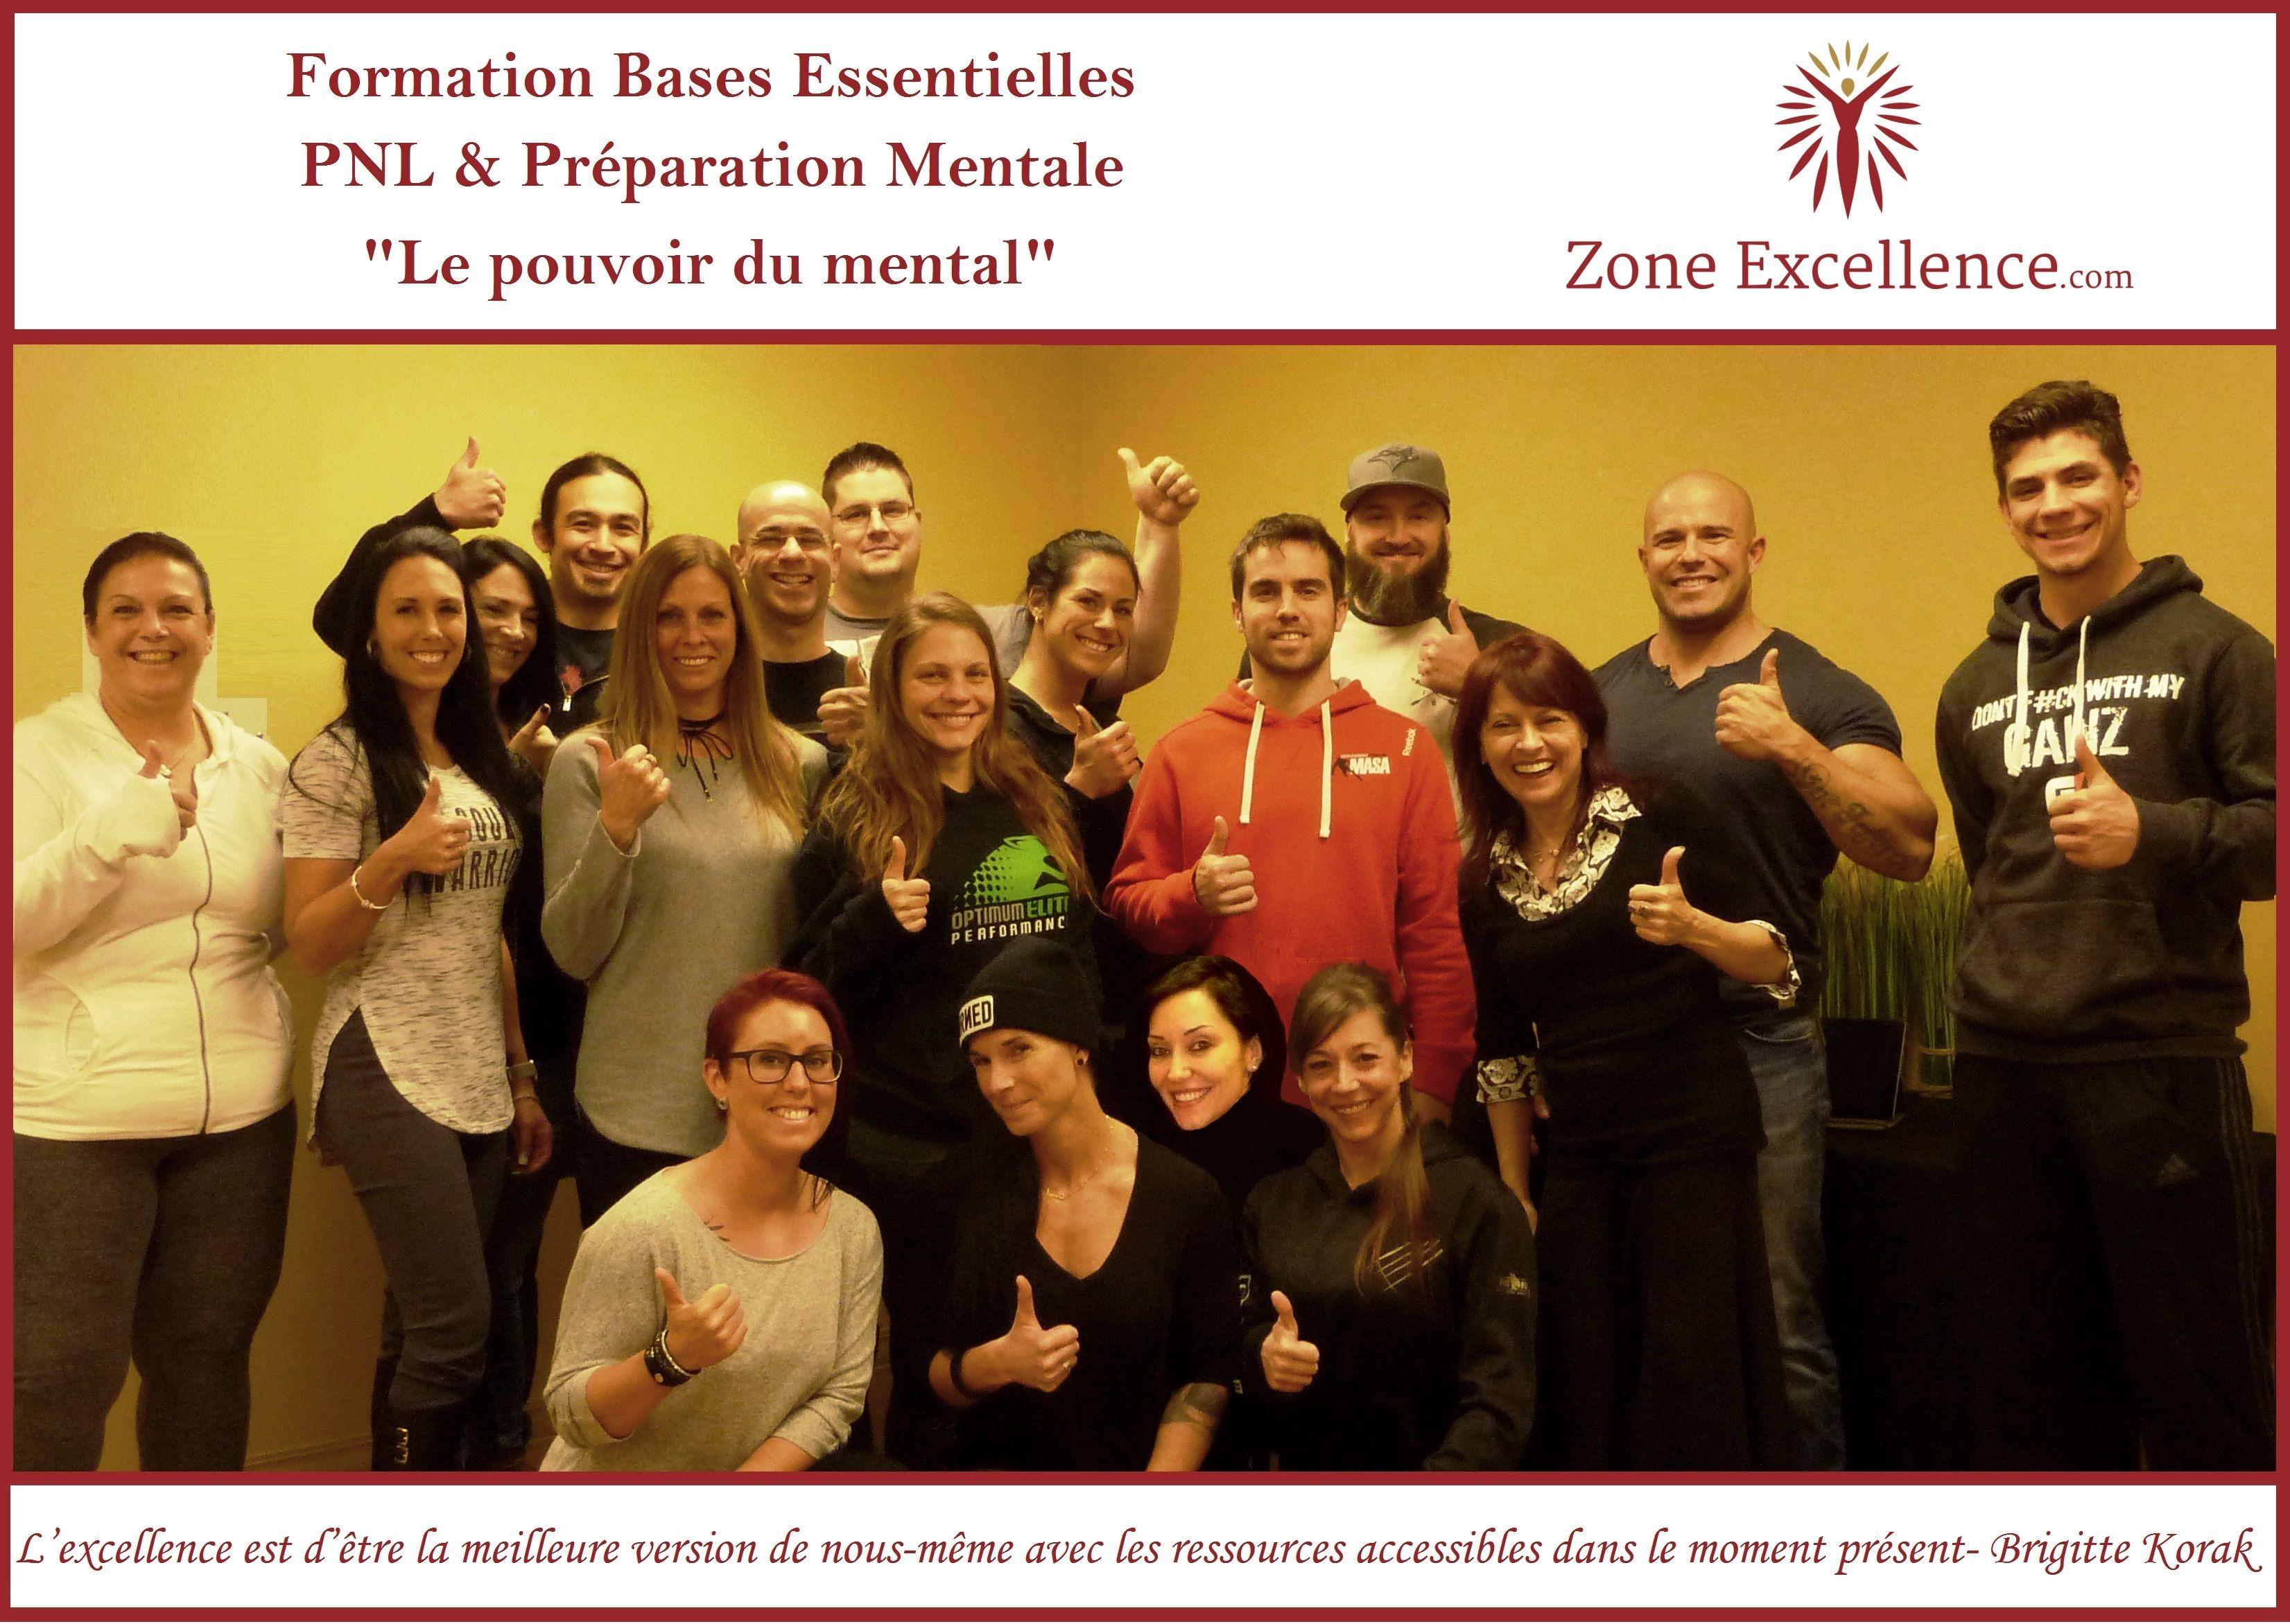 Mindset & Performances - PNL Montreal NLP